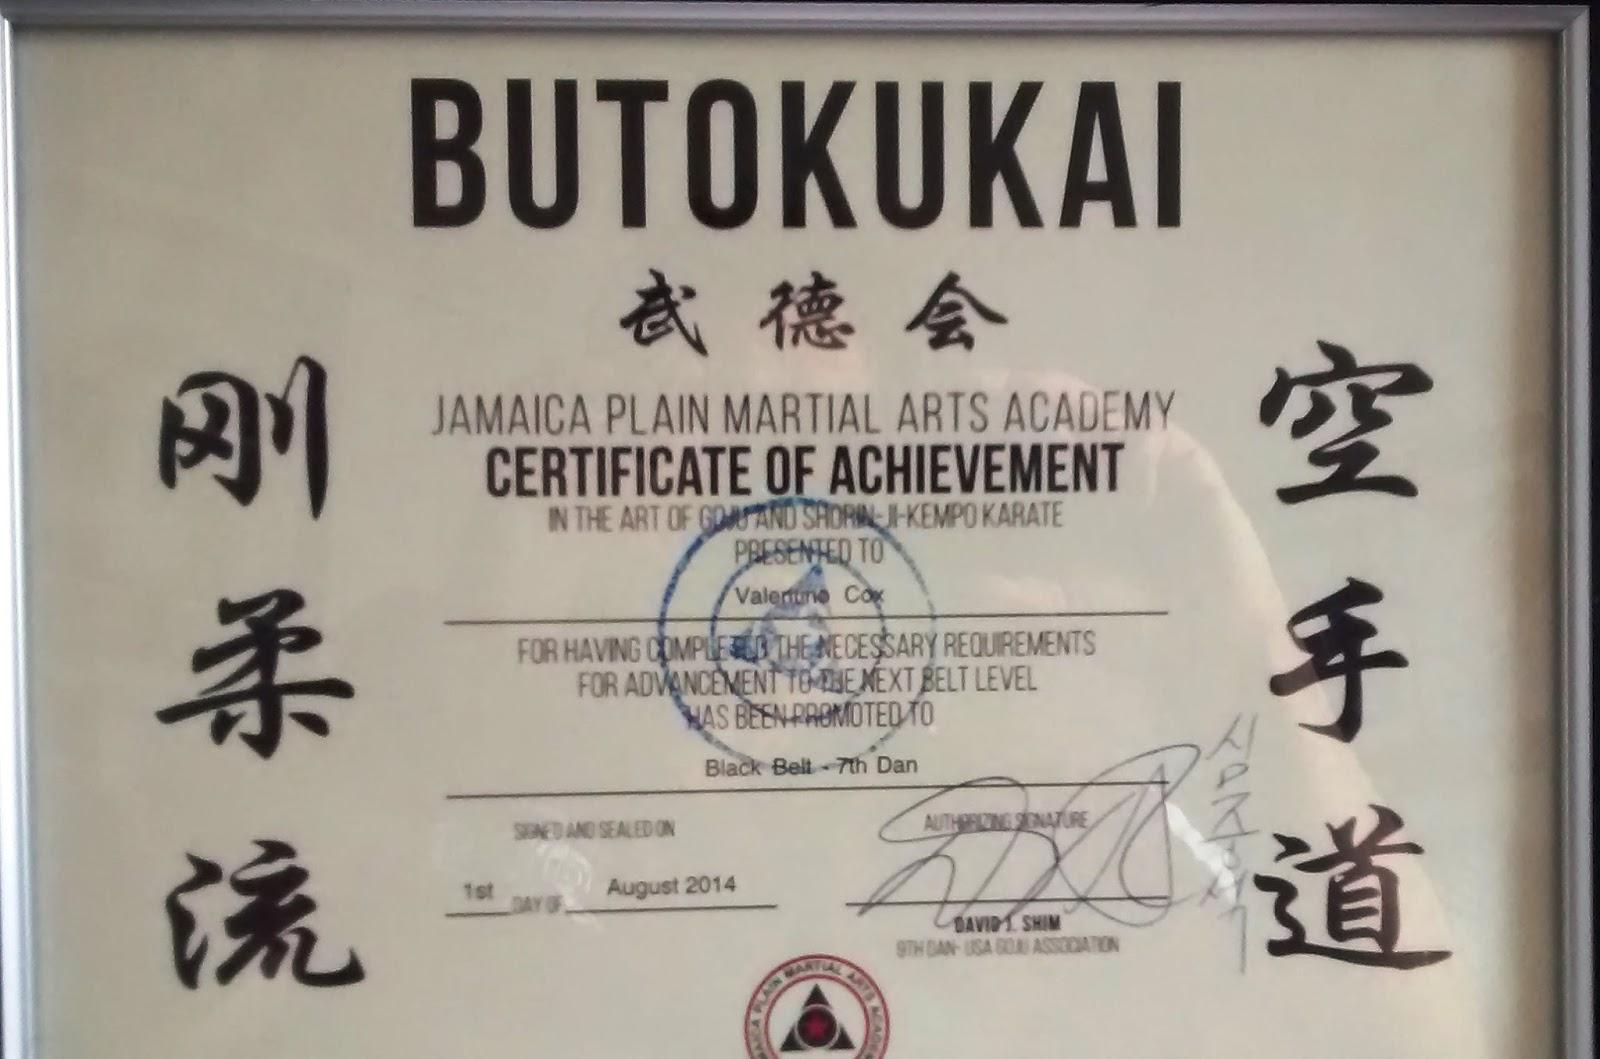 Black Belt 7th Dan In The Usa August 2014 Uechi Go Ryu Karate